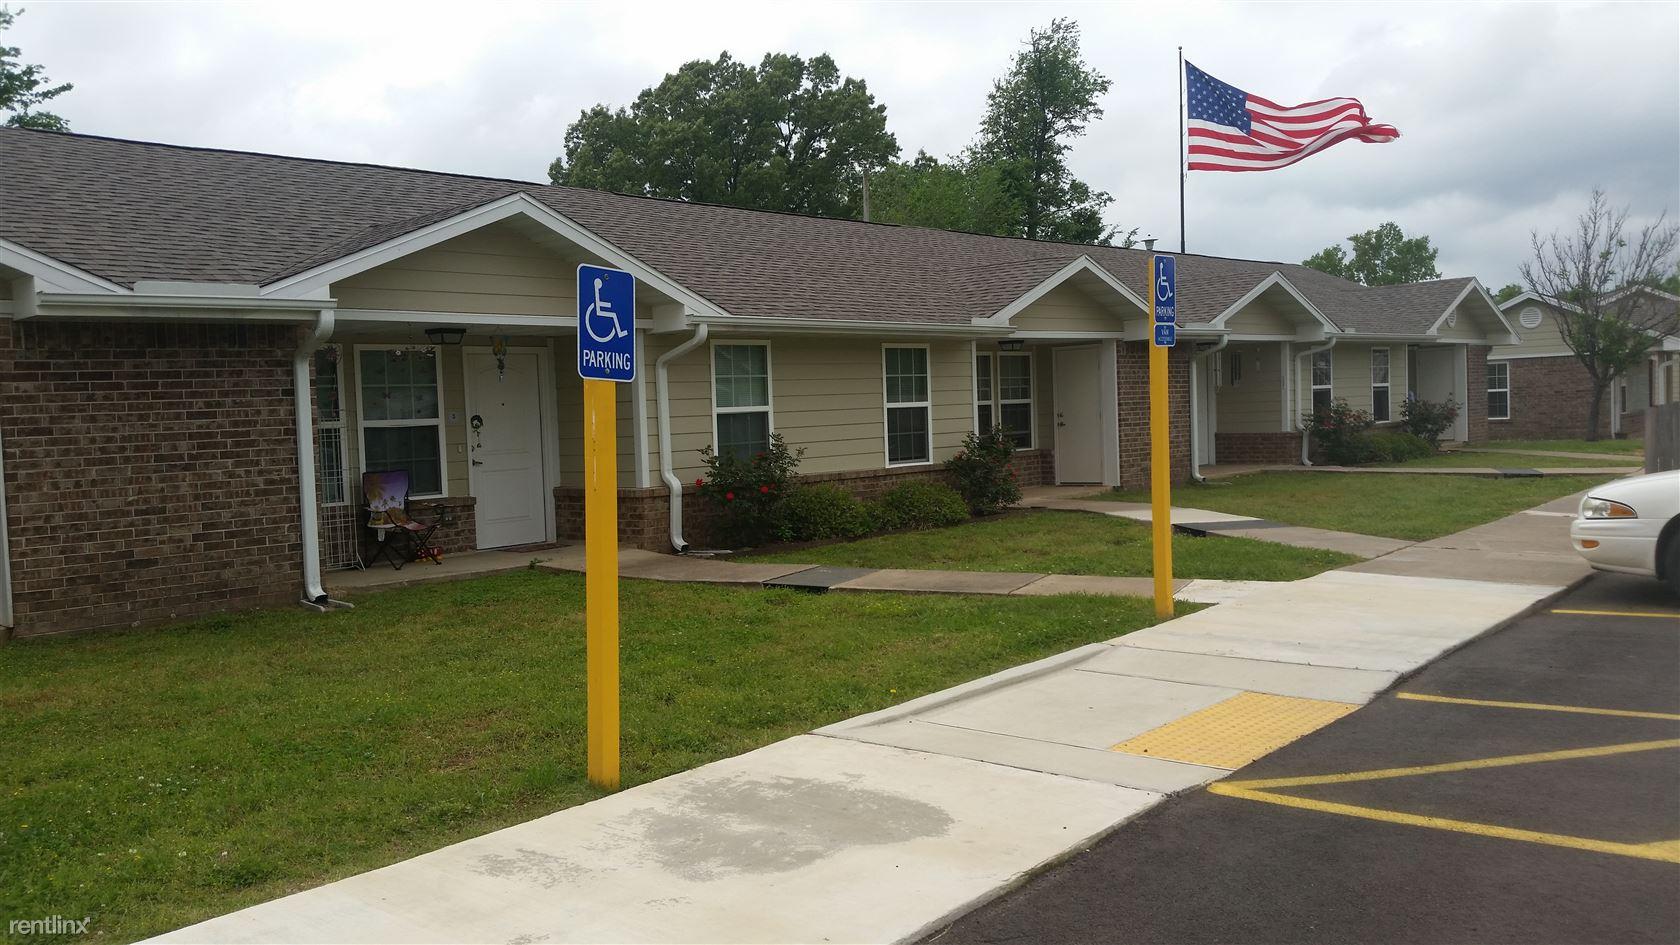 $450 - $650 per month , 407 NW 2nd St, Oakmont Estates II